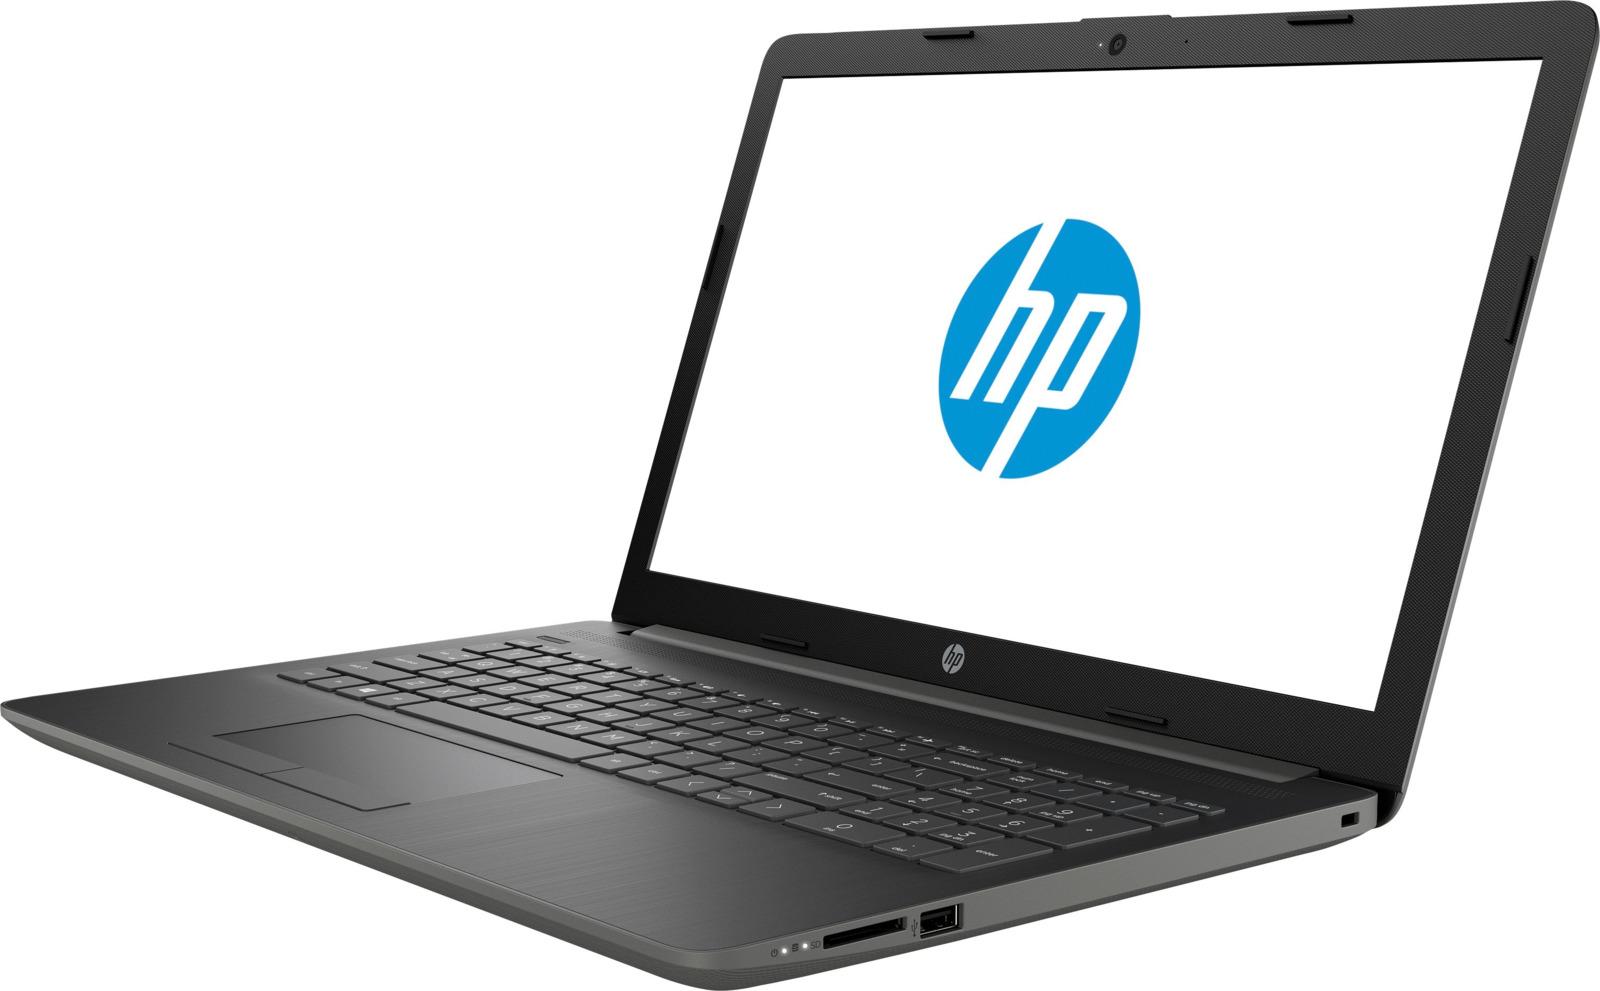 Ноутбук HP 15-db0088ur 4JU60EA, серый ноутбук hp 15 da0149ur